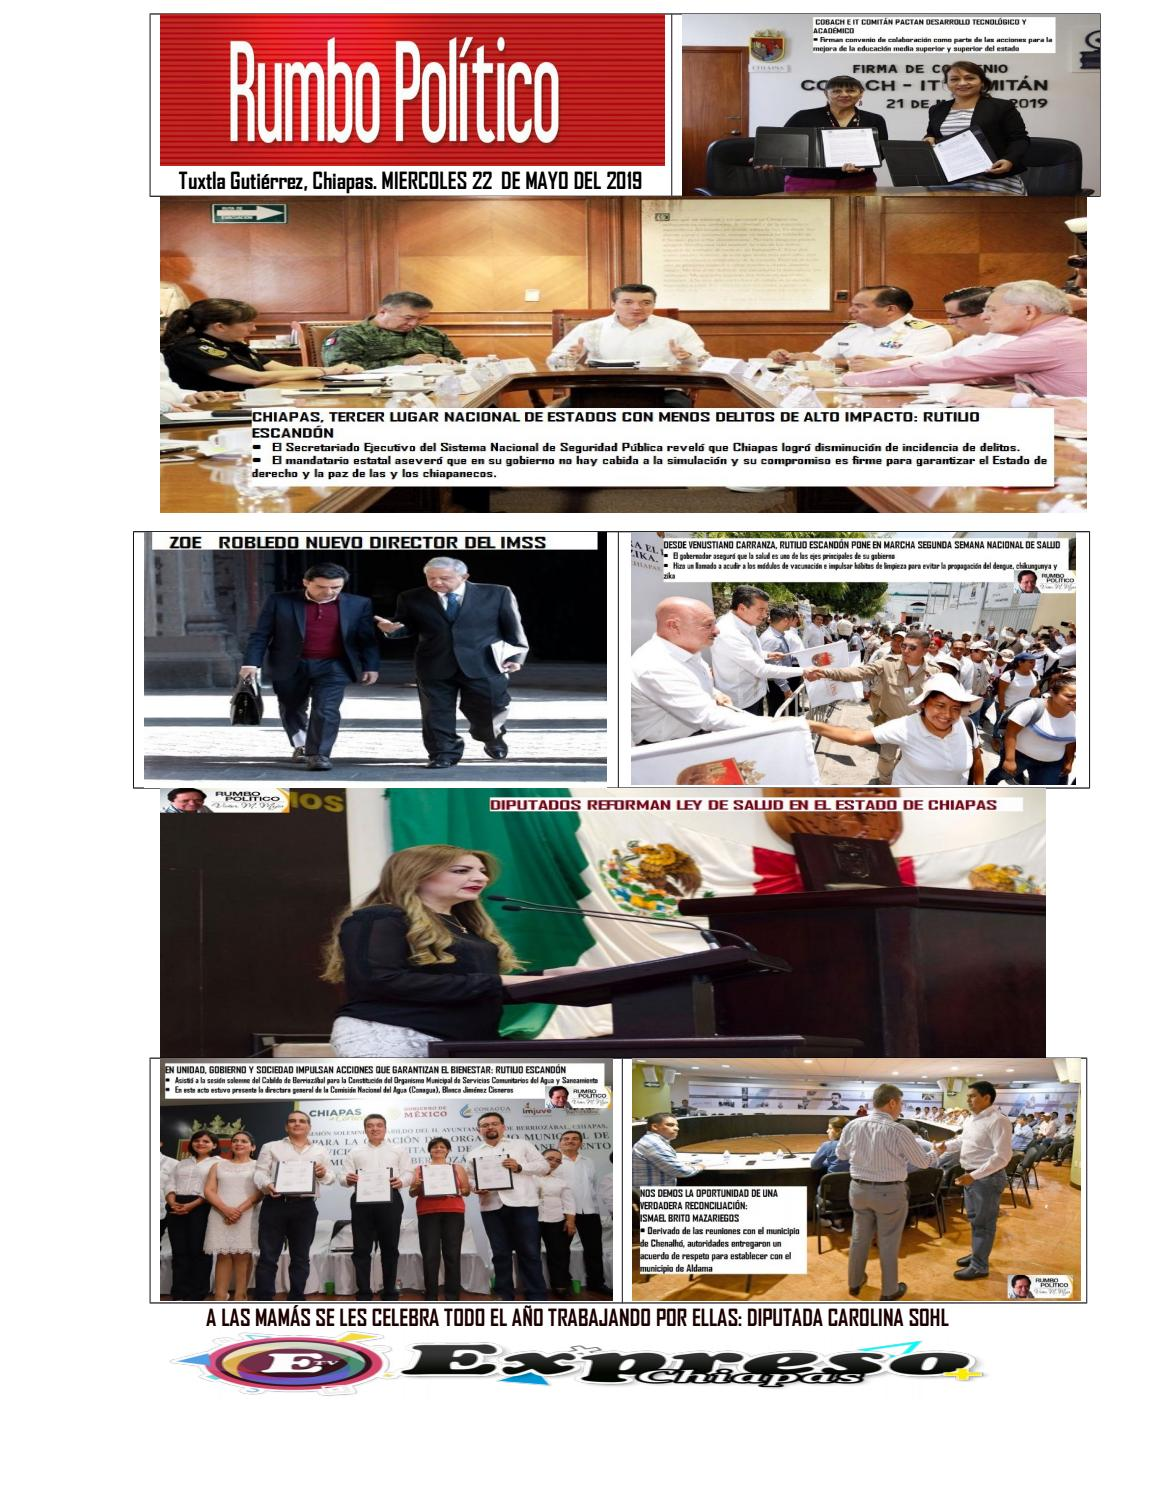 Rumbo Politico El Blog By Victor Mejia Alejandre Issuu